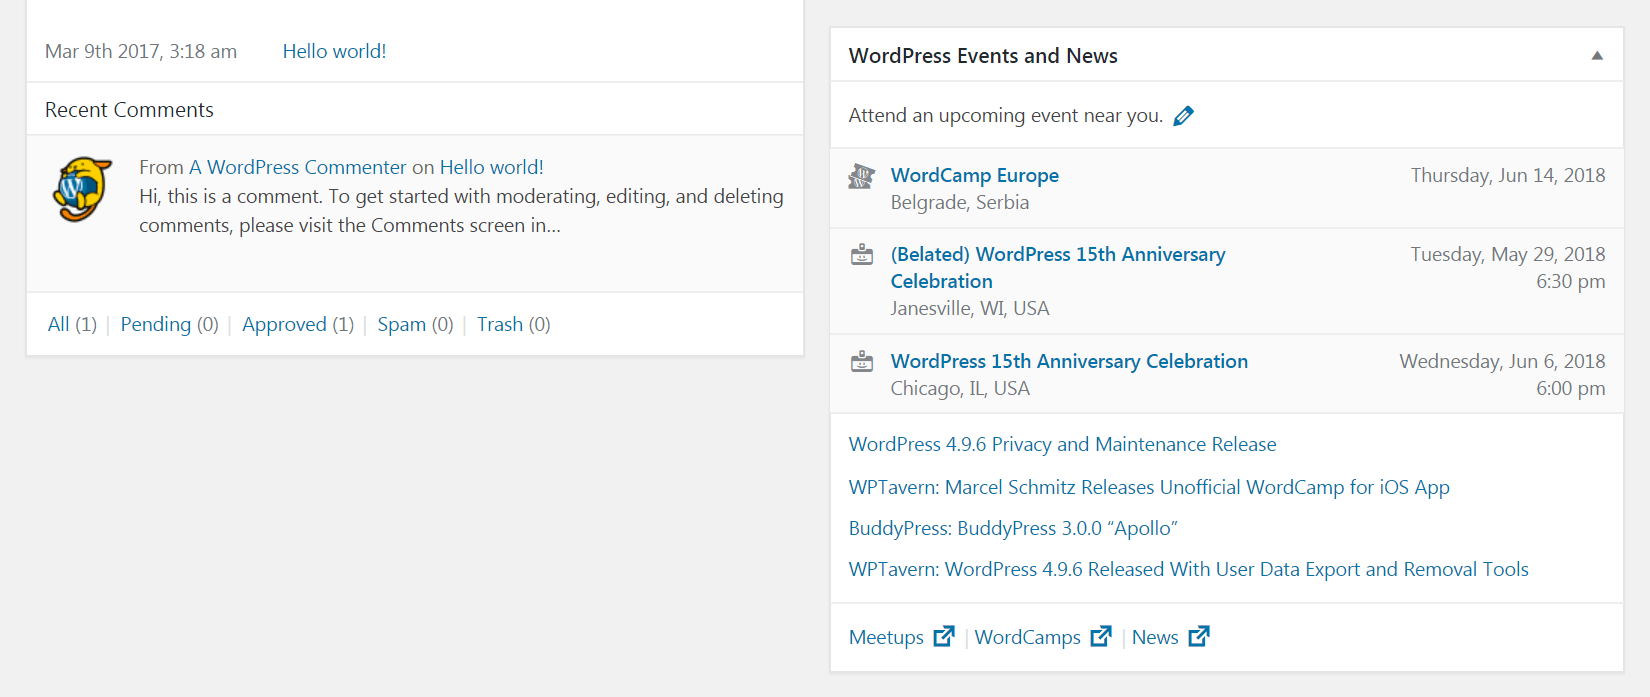 The WordPress Events and News widget.